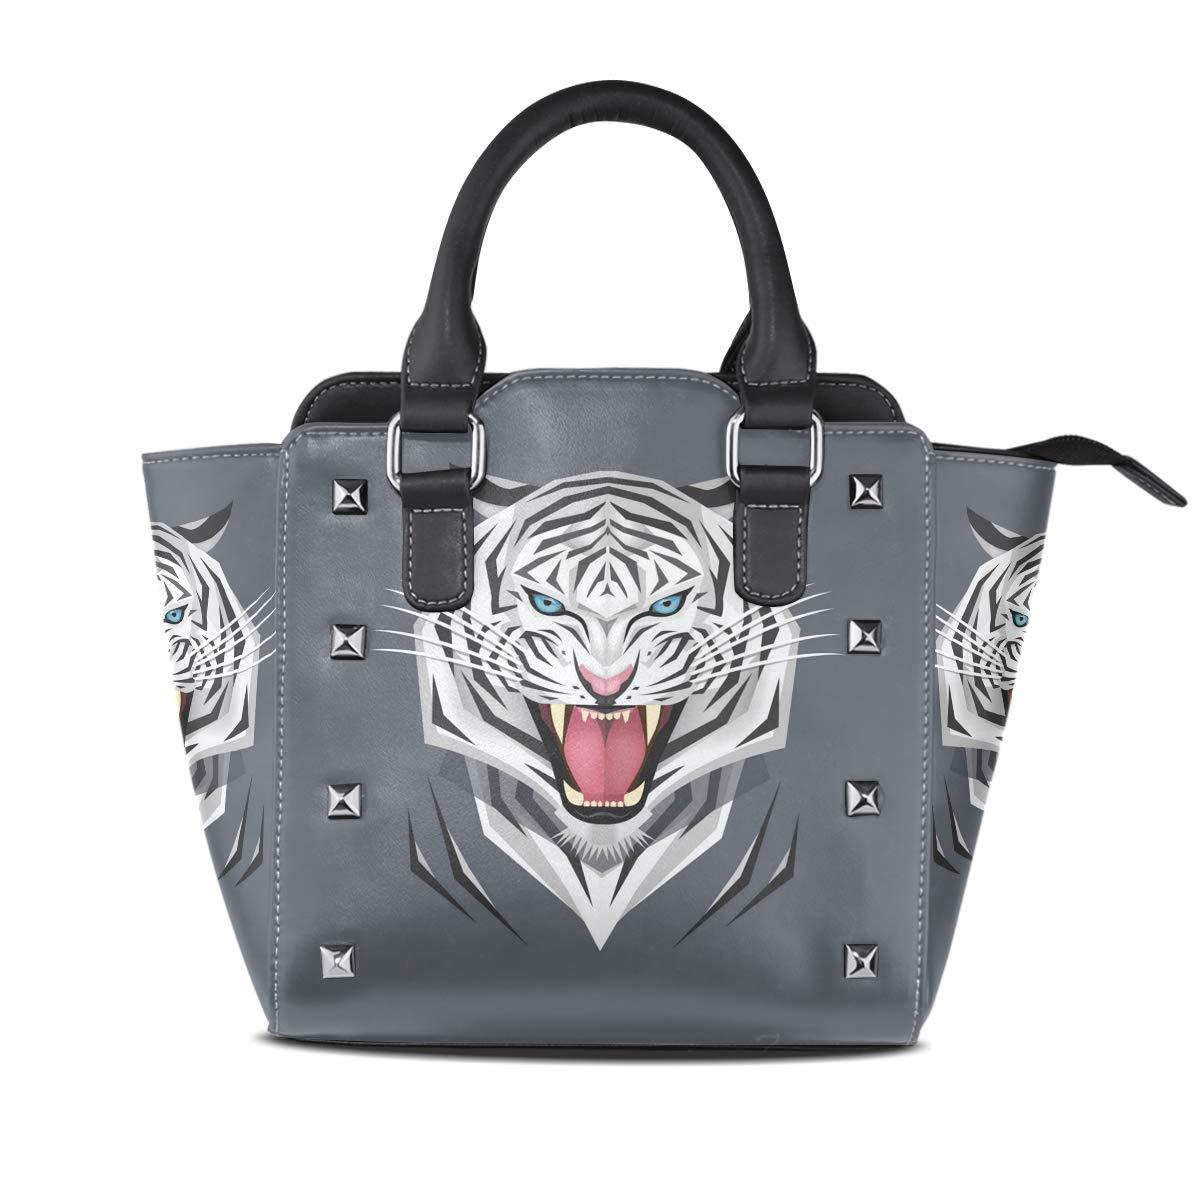 Design4 Cat Top Handle Satchel Handbags Leather Tote Adjustable Shoulder Rivet Bag for Women